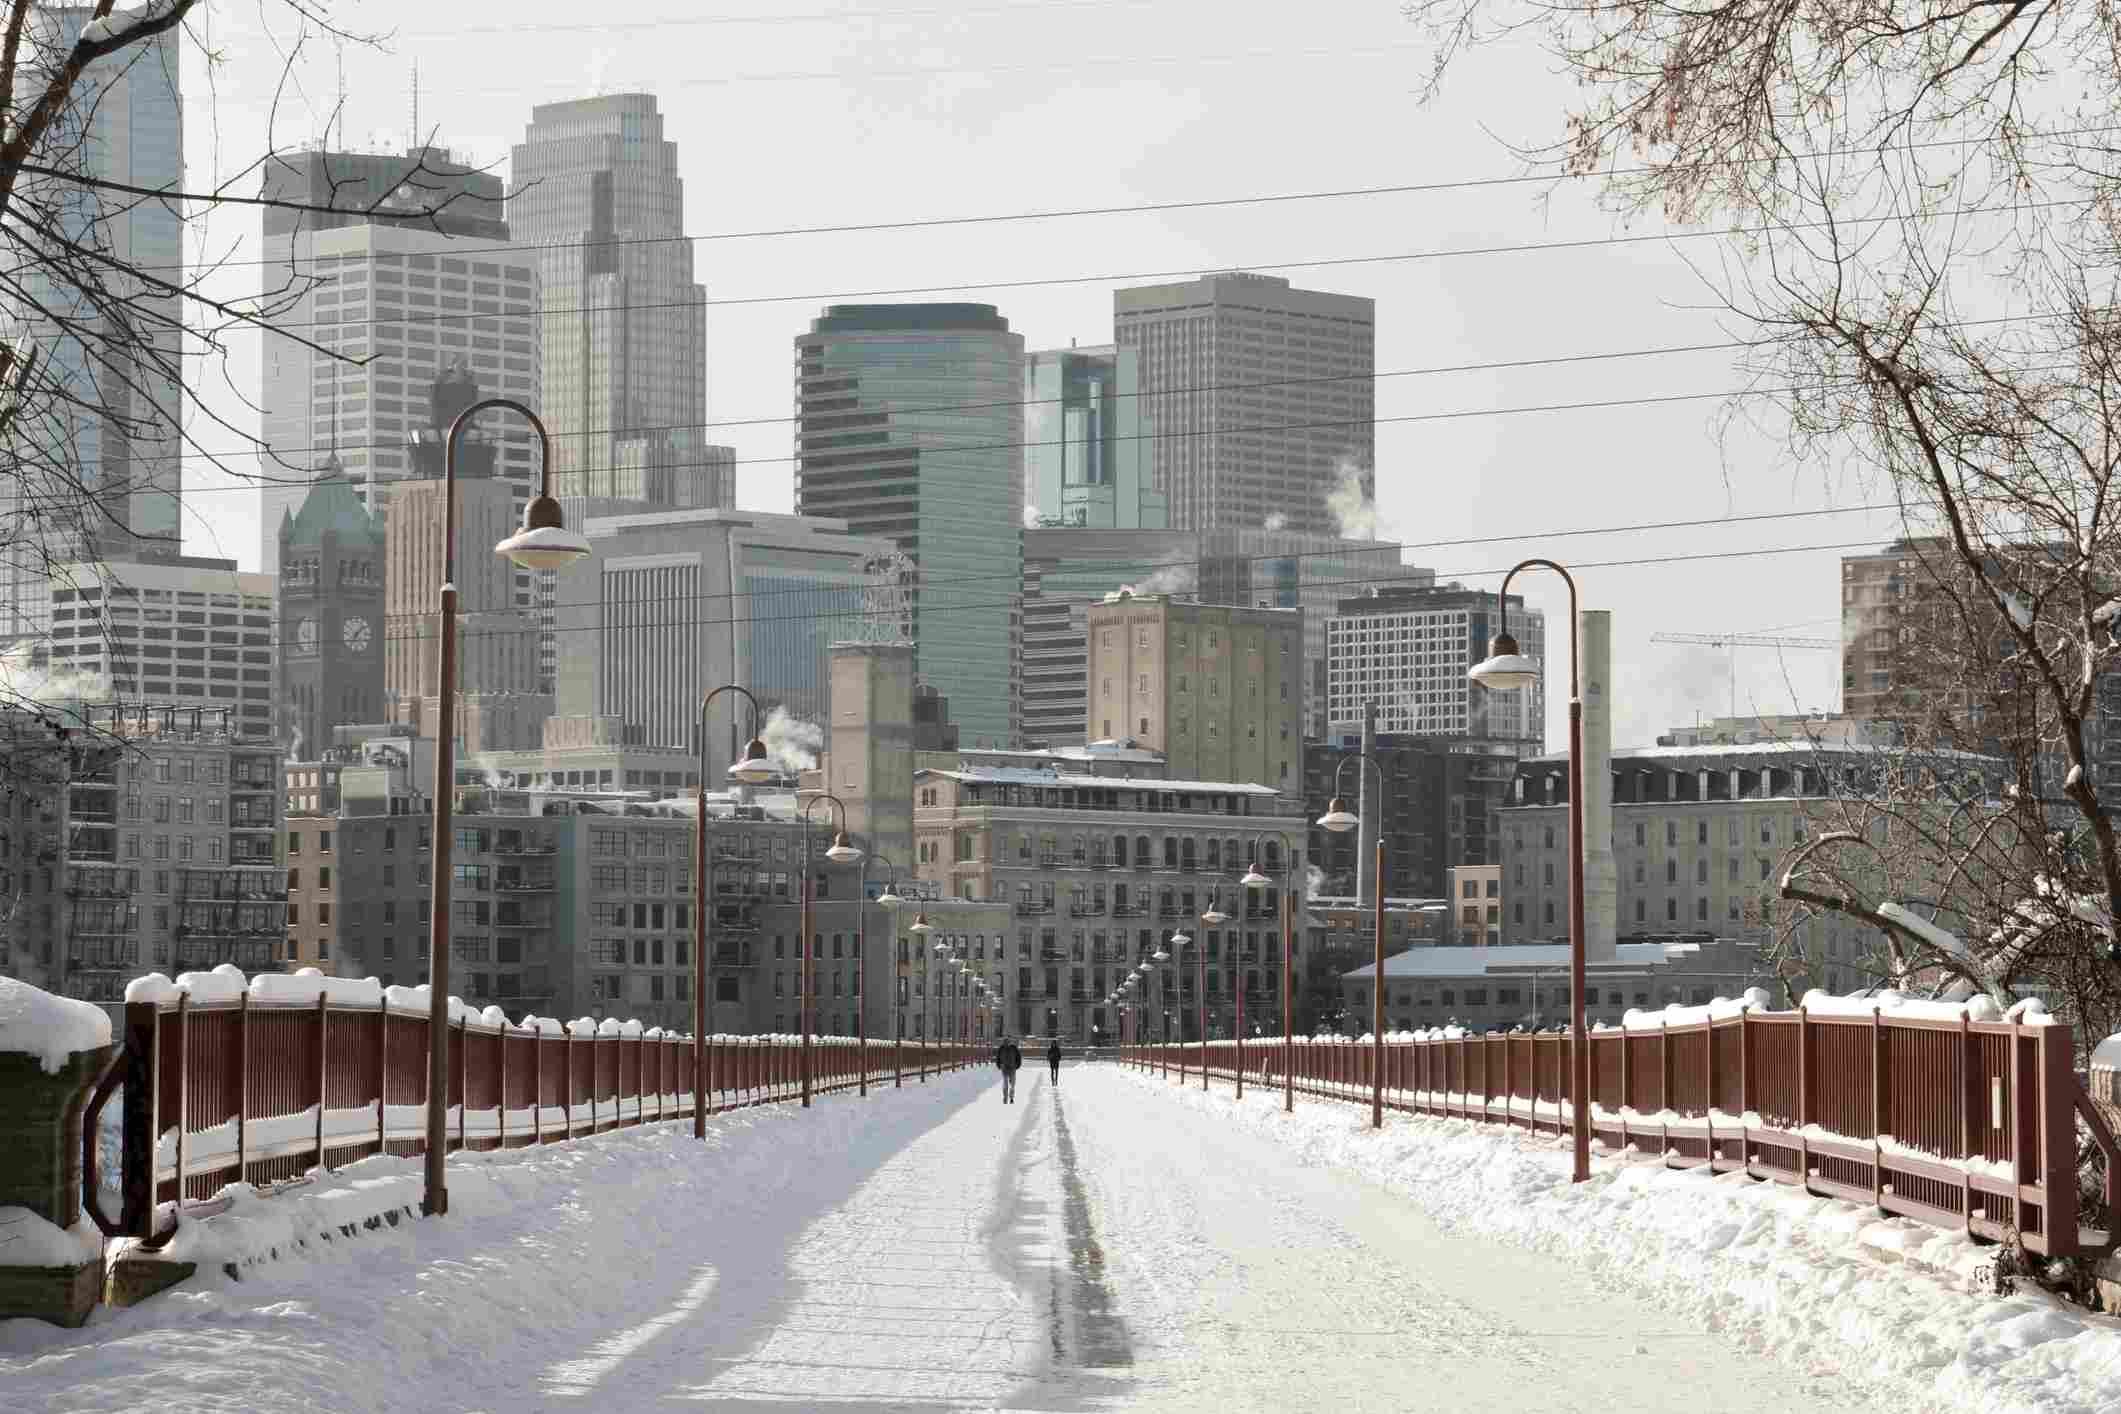 Winter in Minneapolis